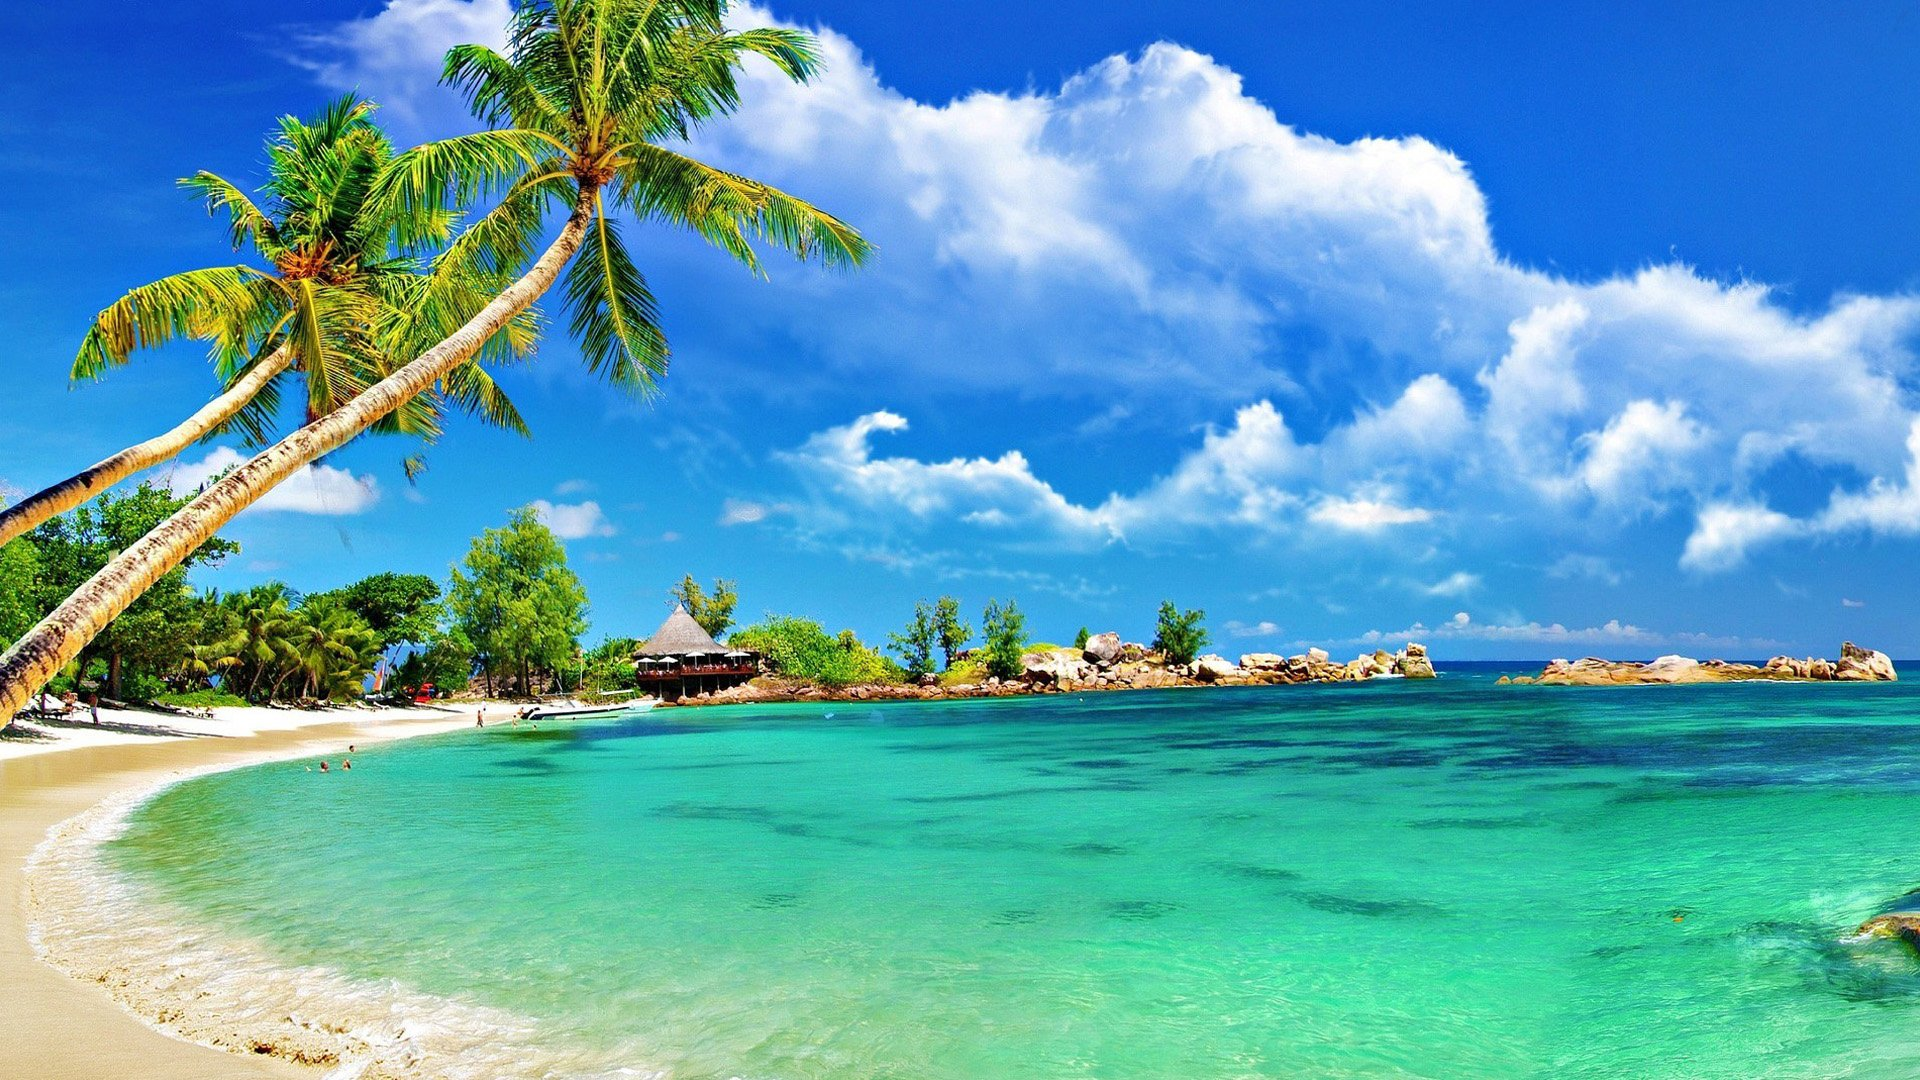 the beautiful seaside scenery - photo #35